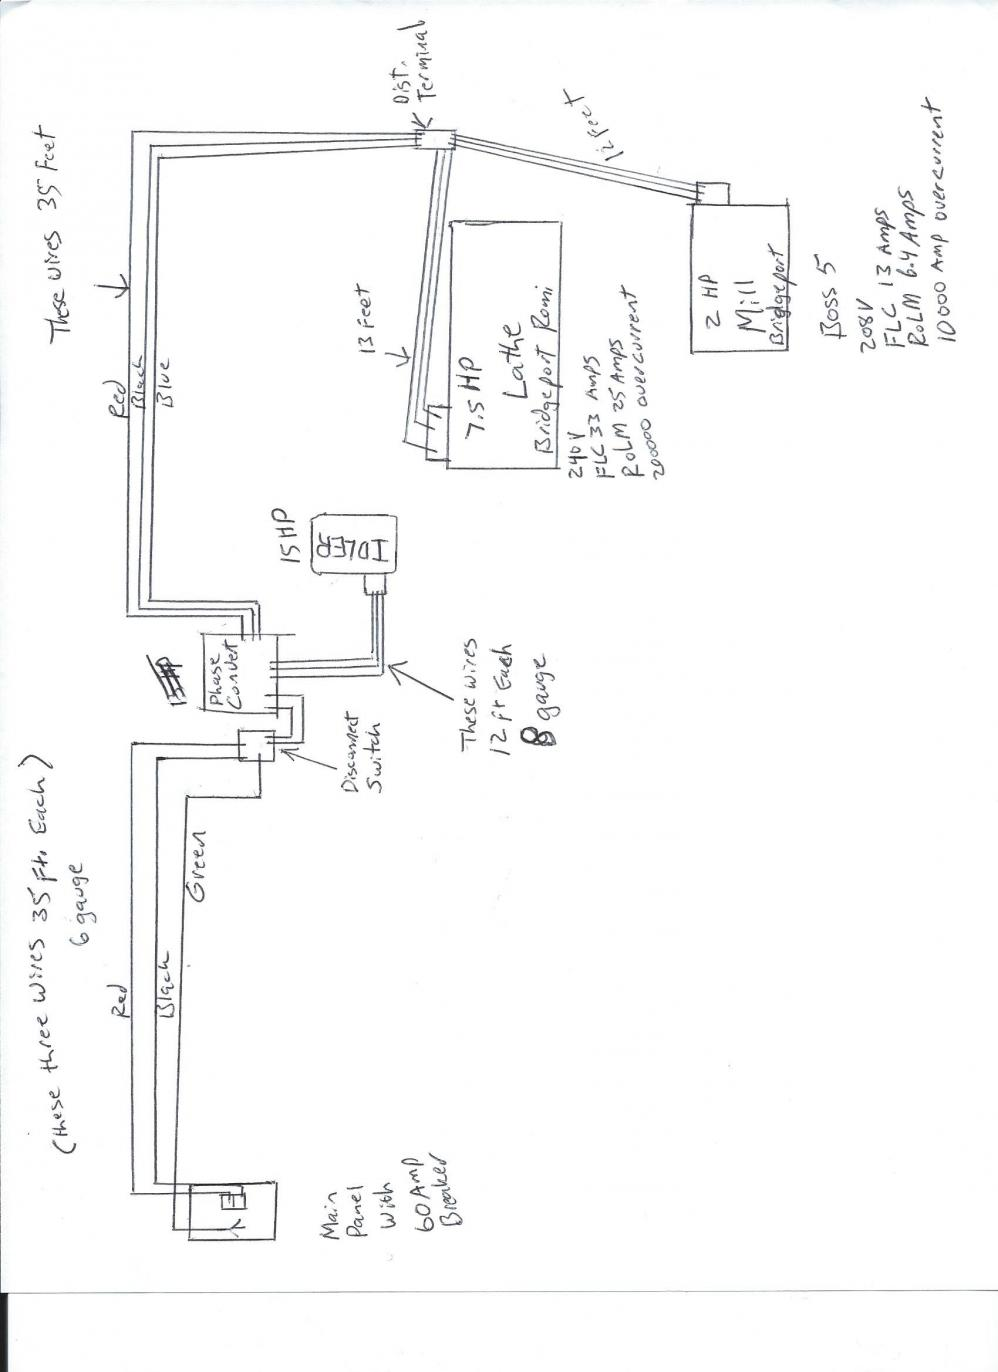 Fantastic alpine cde 121 wire diagram adornment wiring diagram boss hoss wiring diagram wiring zx12r wiring diagram vz800 wiring cheapraybanclubmaster Images